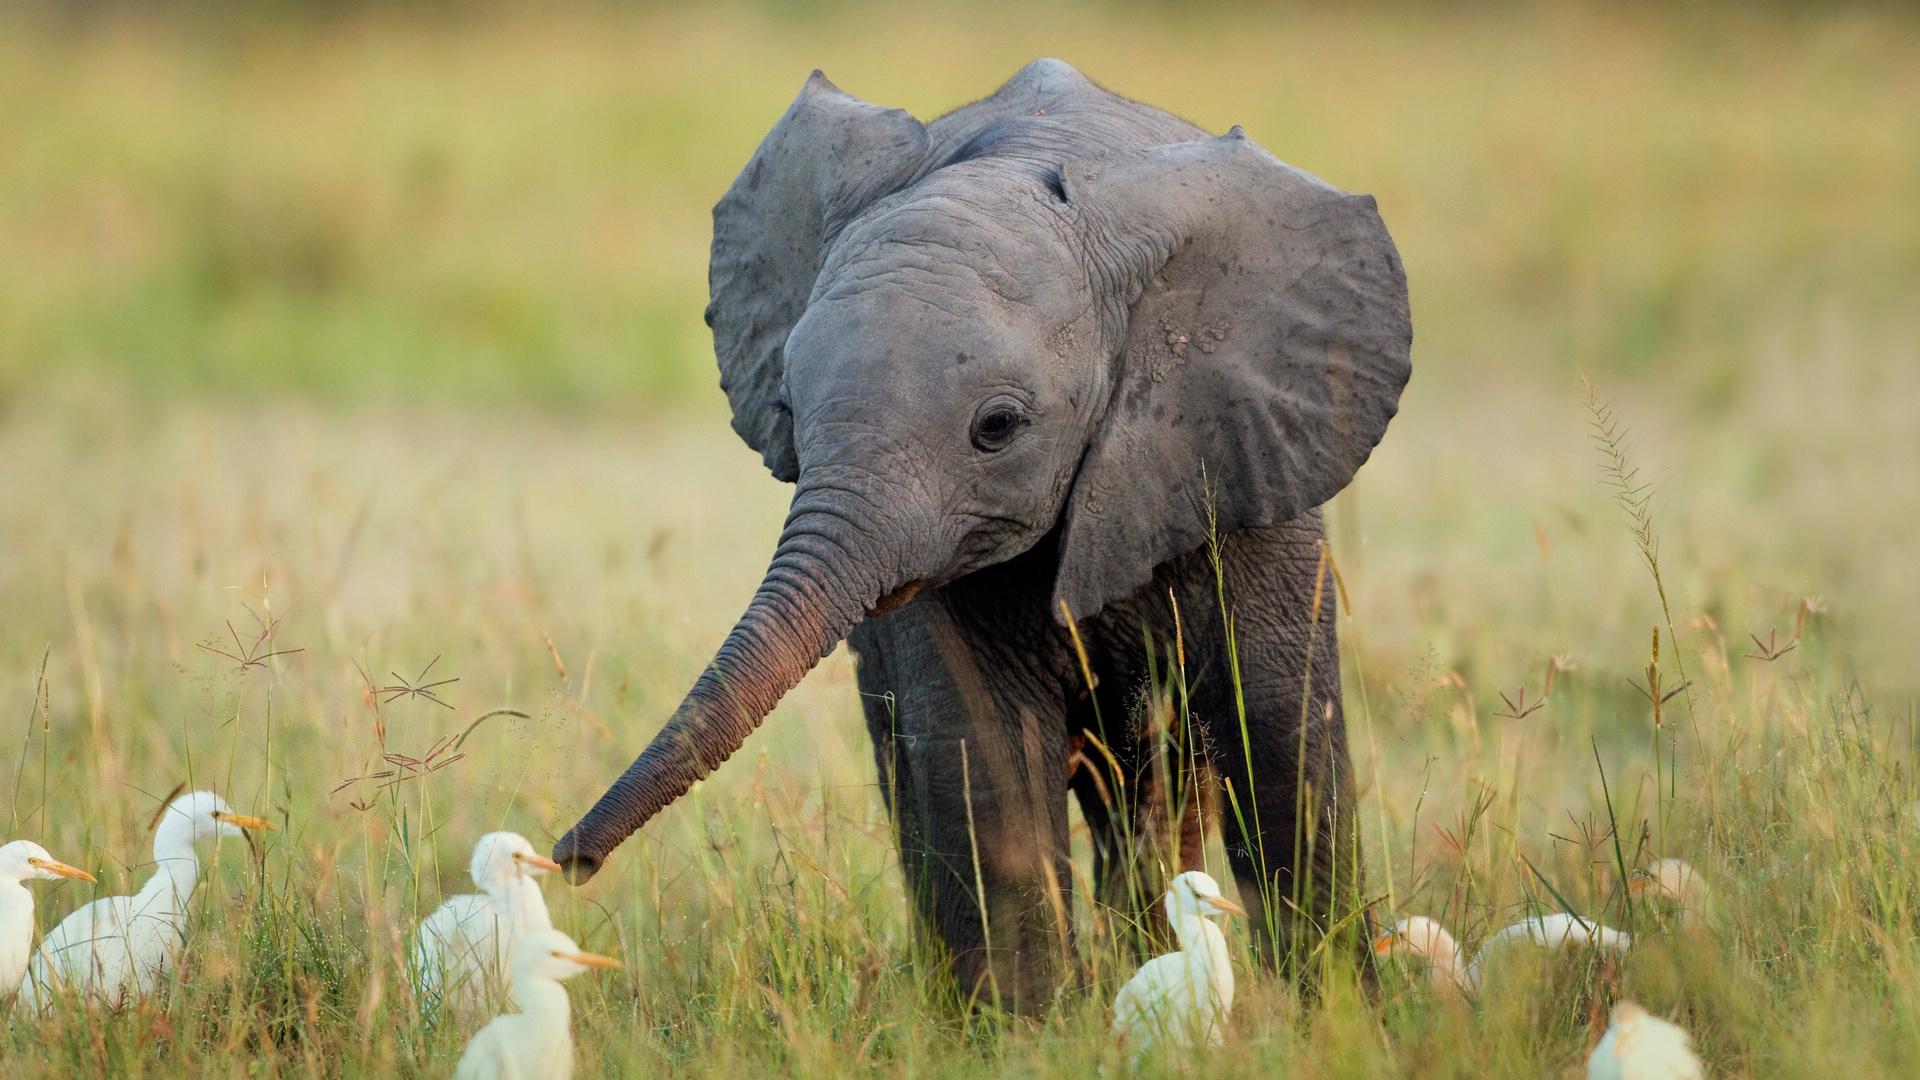 птицы, слоненок, трава, слон, Африка